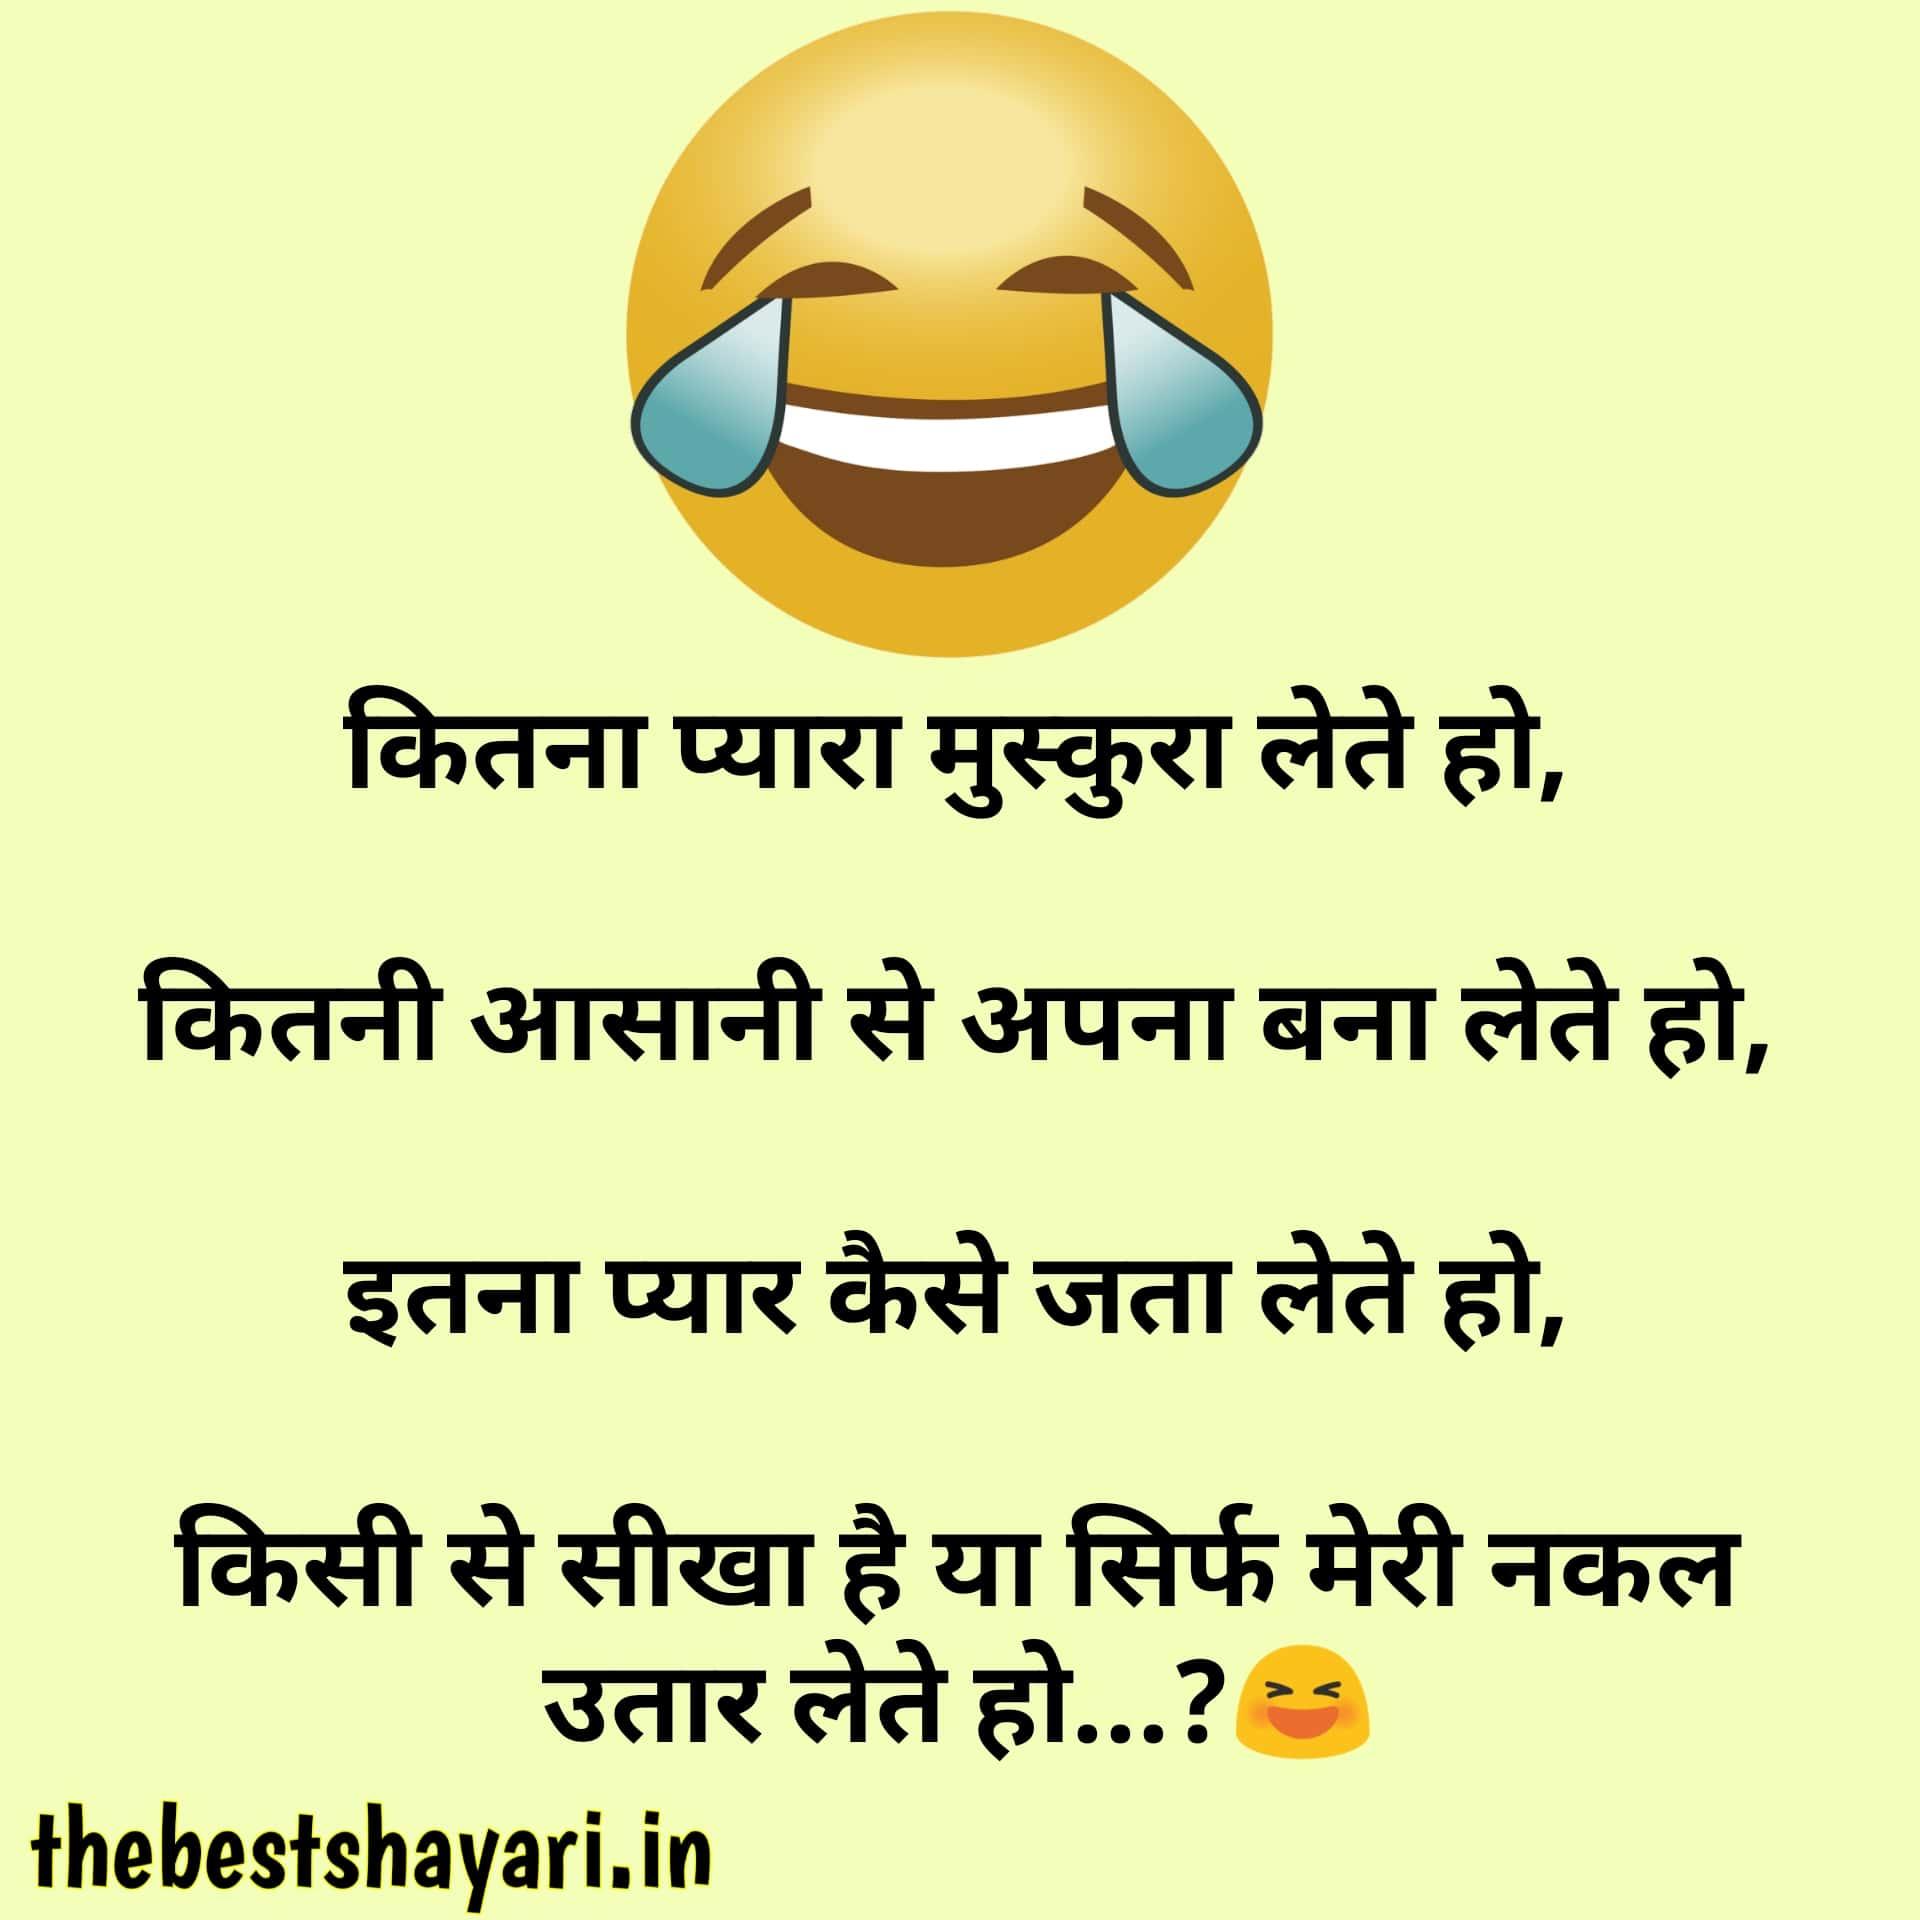 Funny Hindi shayari for friends